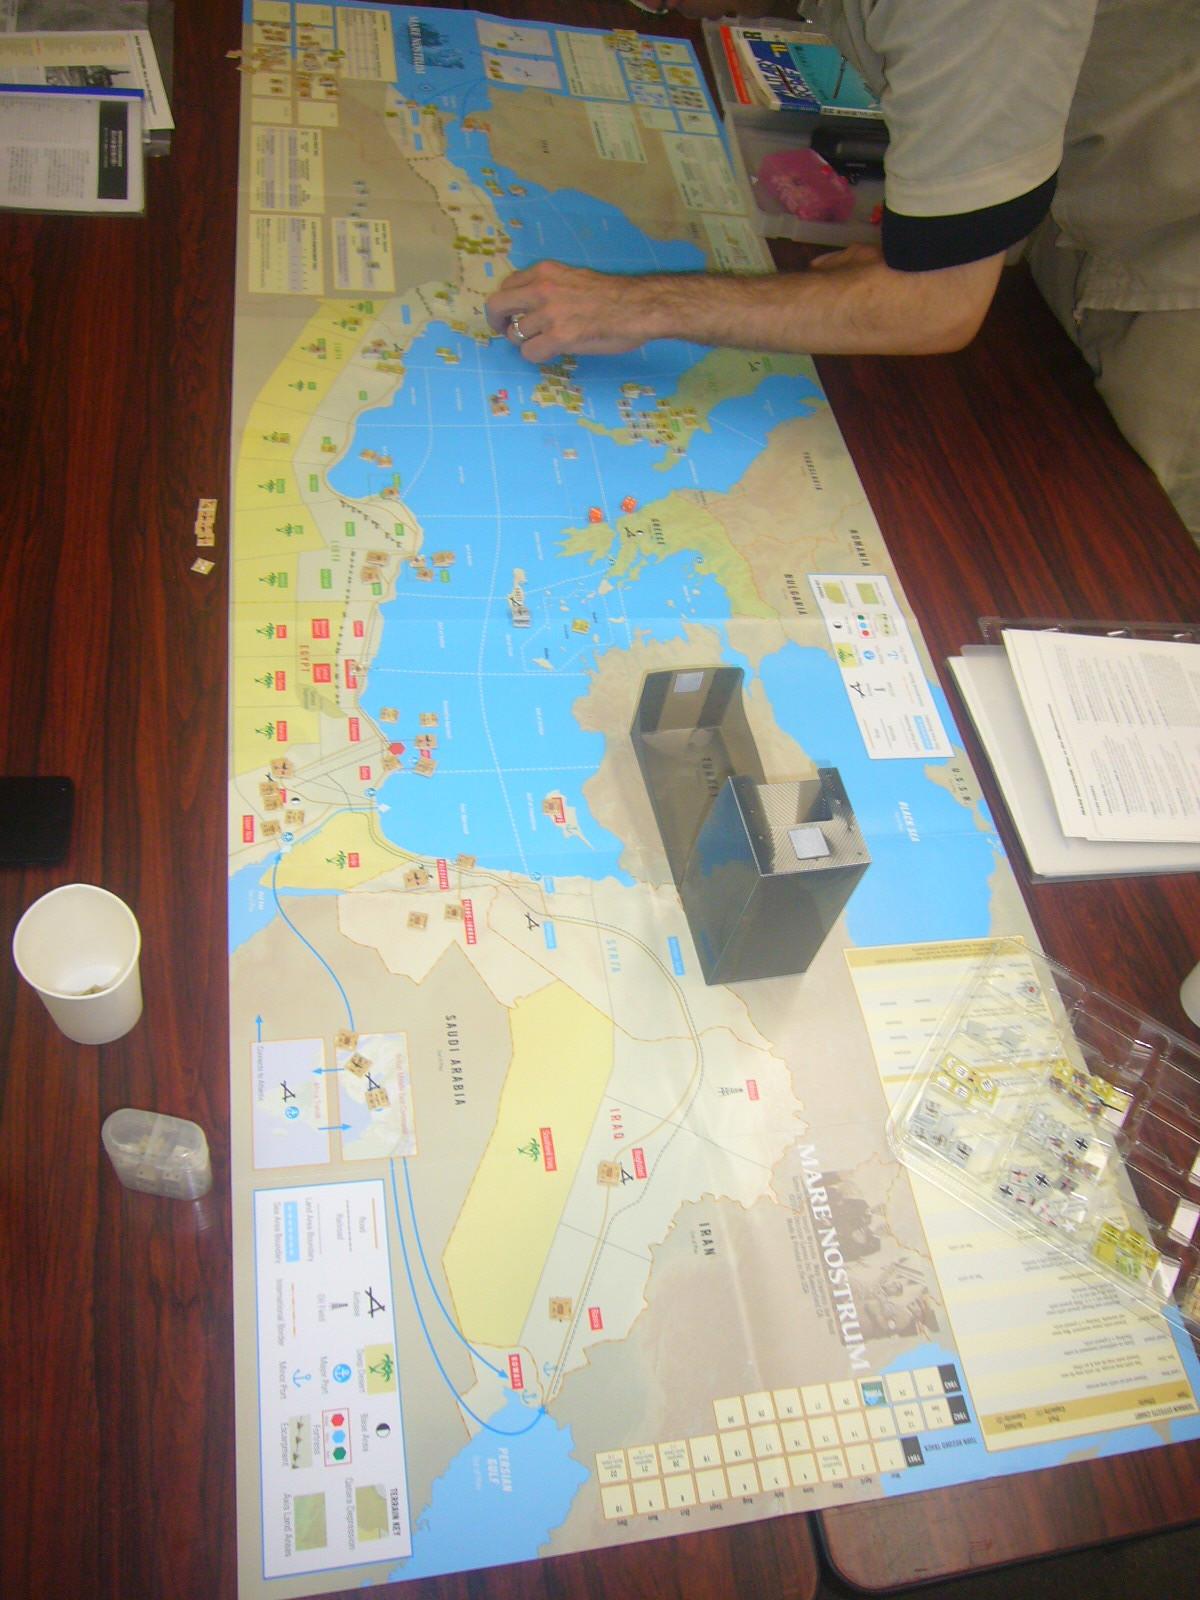 YSGA8月例会の様子その5〔これもひとつの地中海キャンペーン:(WaW誌)Mare Nostrum: War in the Mediterranean〕_b0173672_20091691.jpg